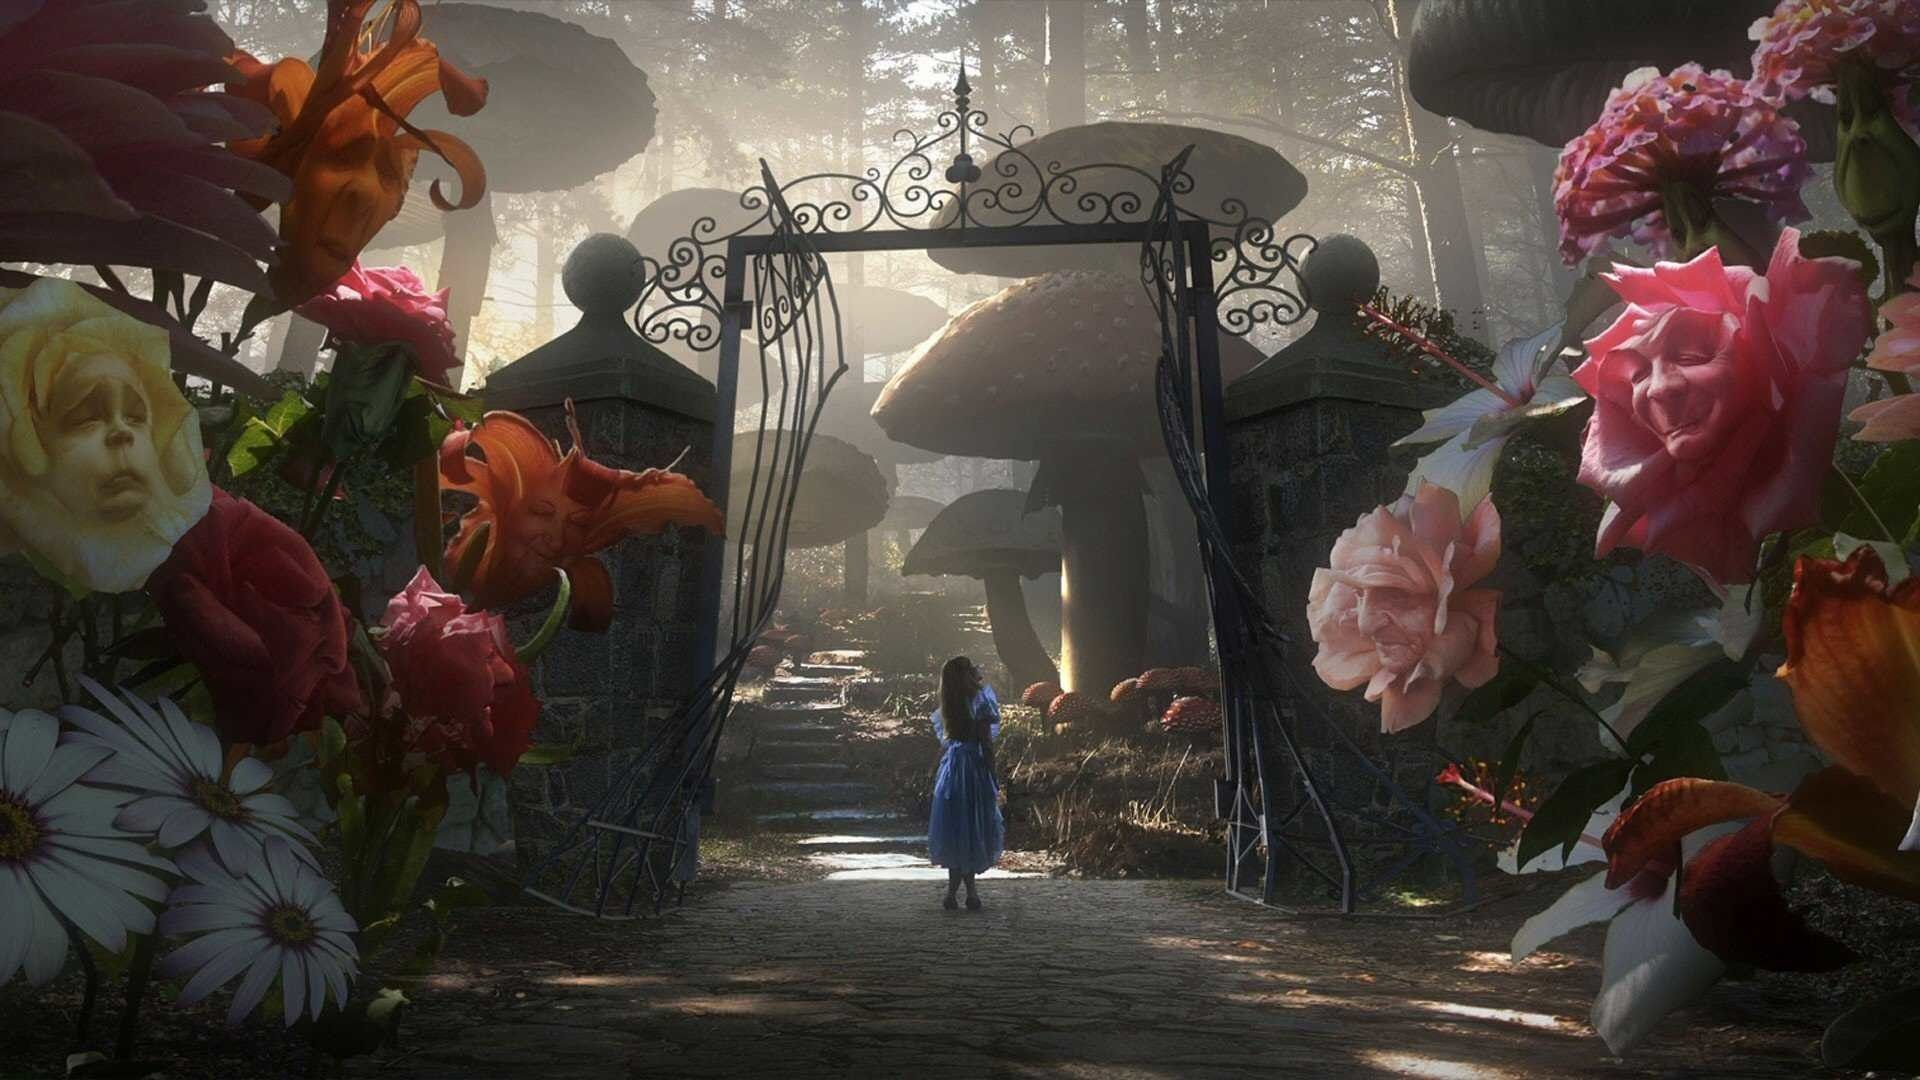 1920x1080 Thomas Kinkade Alice Wallpaper Website Screensavers Wonderland Screensaver I Alice In Wonderland Garden Alice In Wonderland Adventures In Wonderland